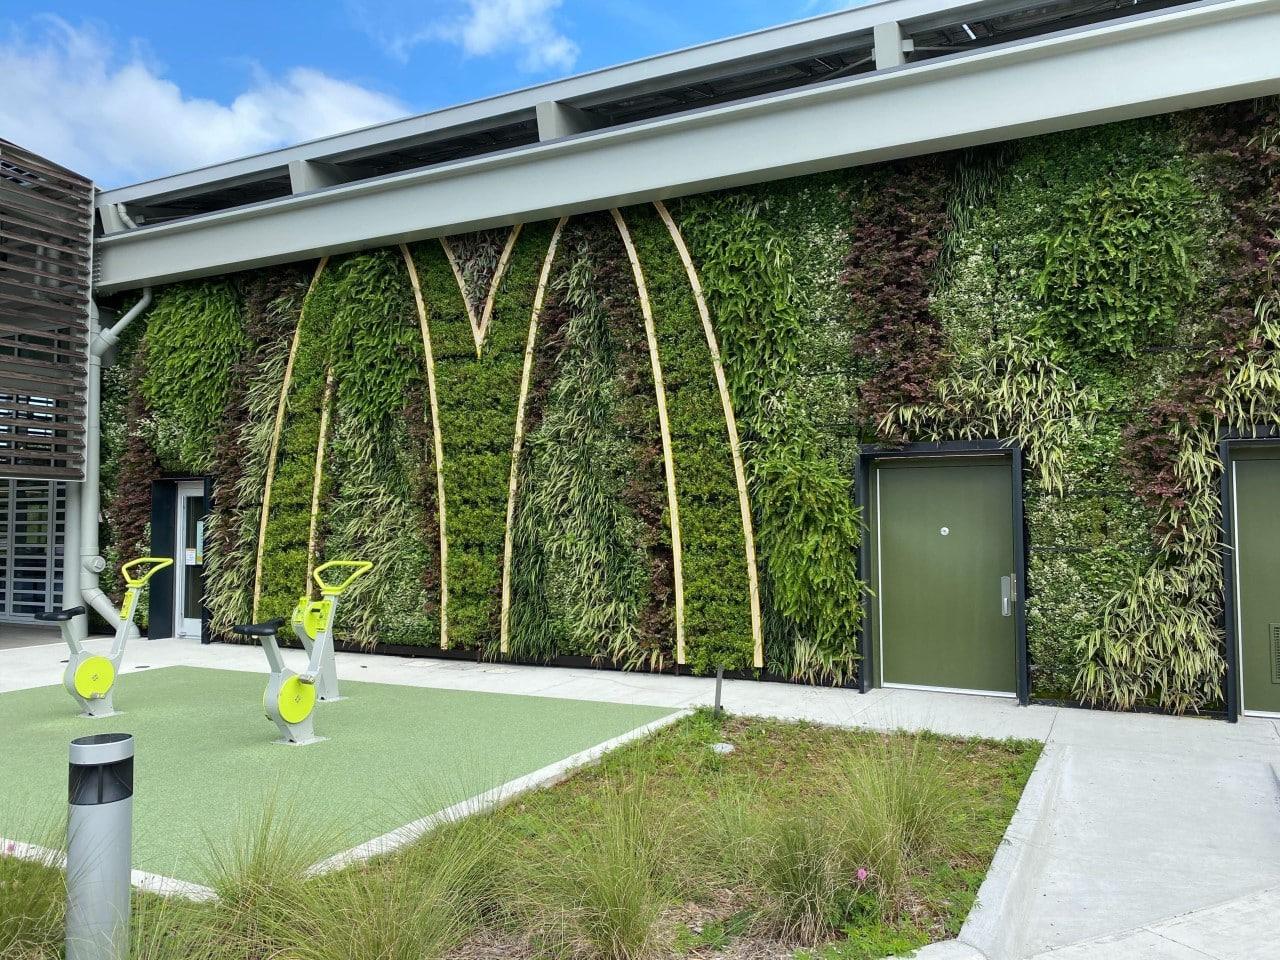 Groene gevel McDonald's in Orlando, Florida, VS